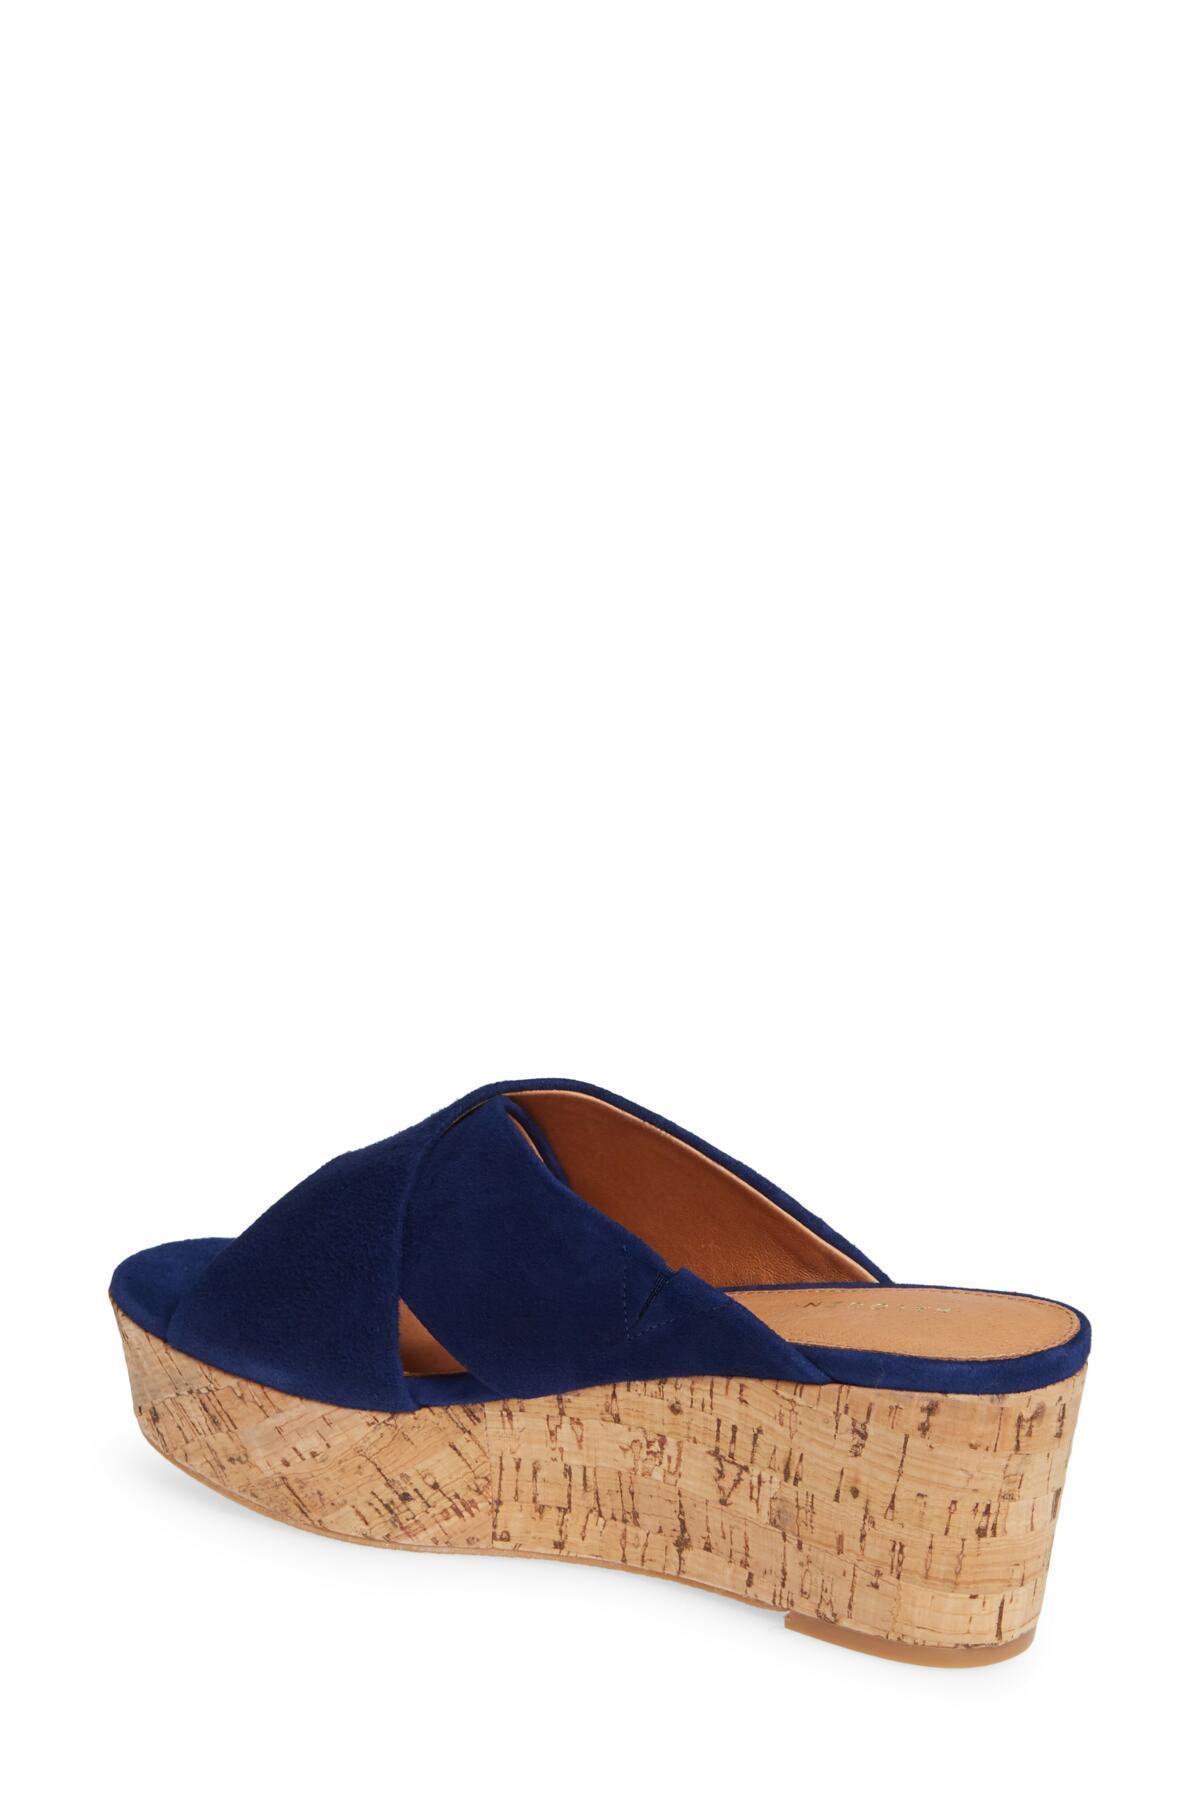 8fdb67221bf Halogen - Blue (r) Elena Platform Wedge Sandal (women) - Lyst. View  fullscreen